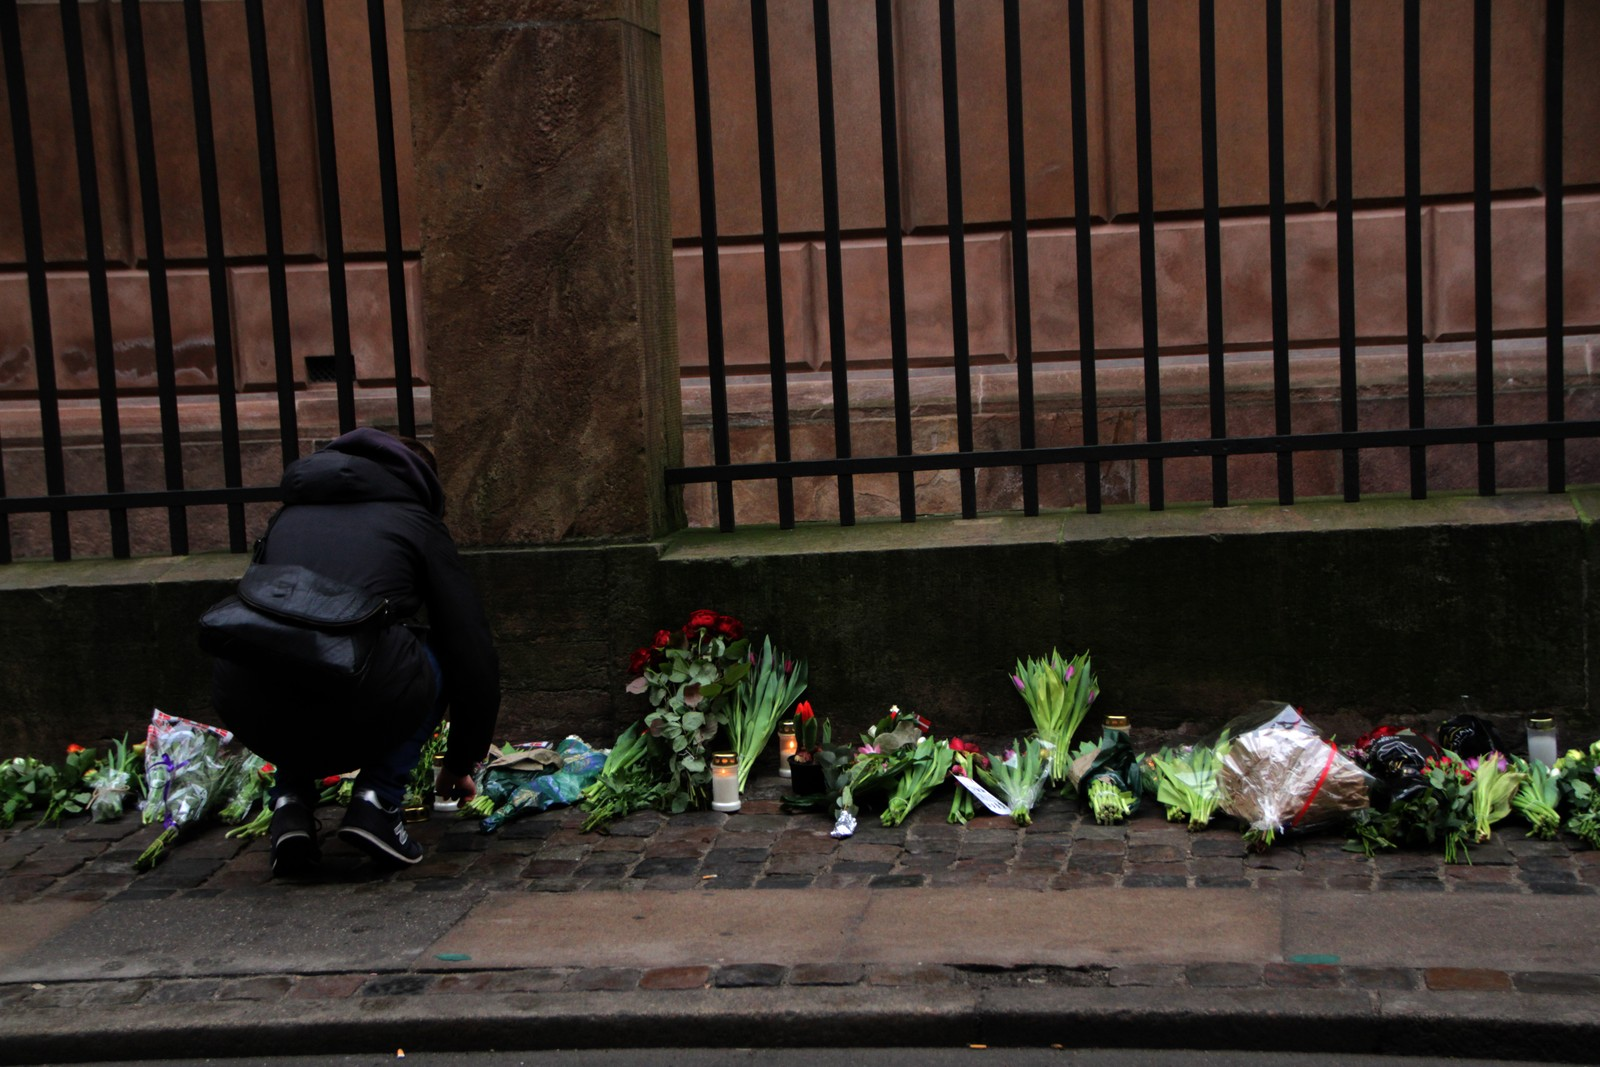 Søndag har mange lagt blomster og tent lys utenfor synagogen, midt i den danske hovedstaden.